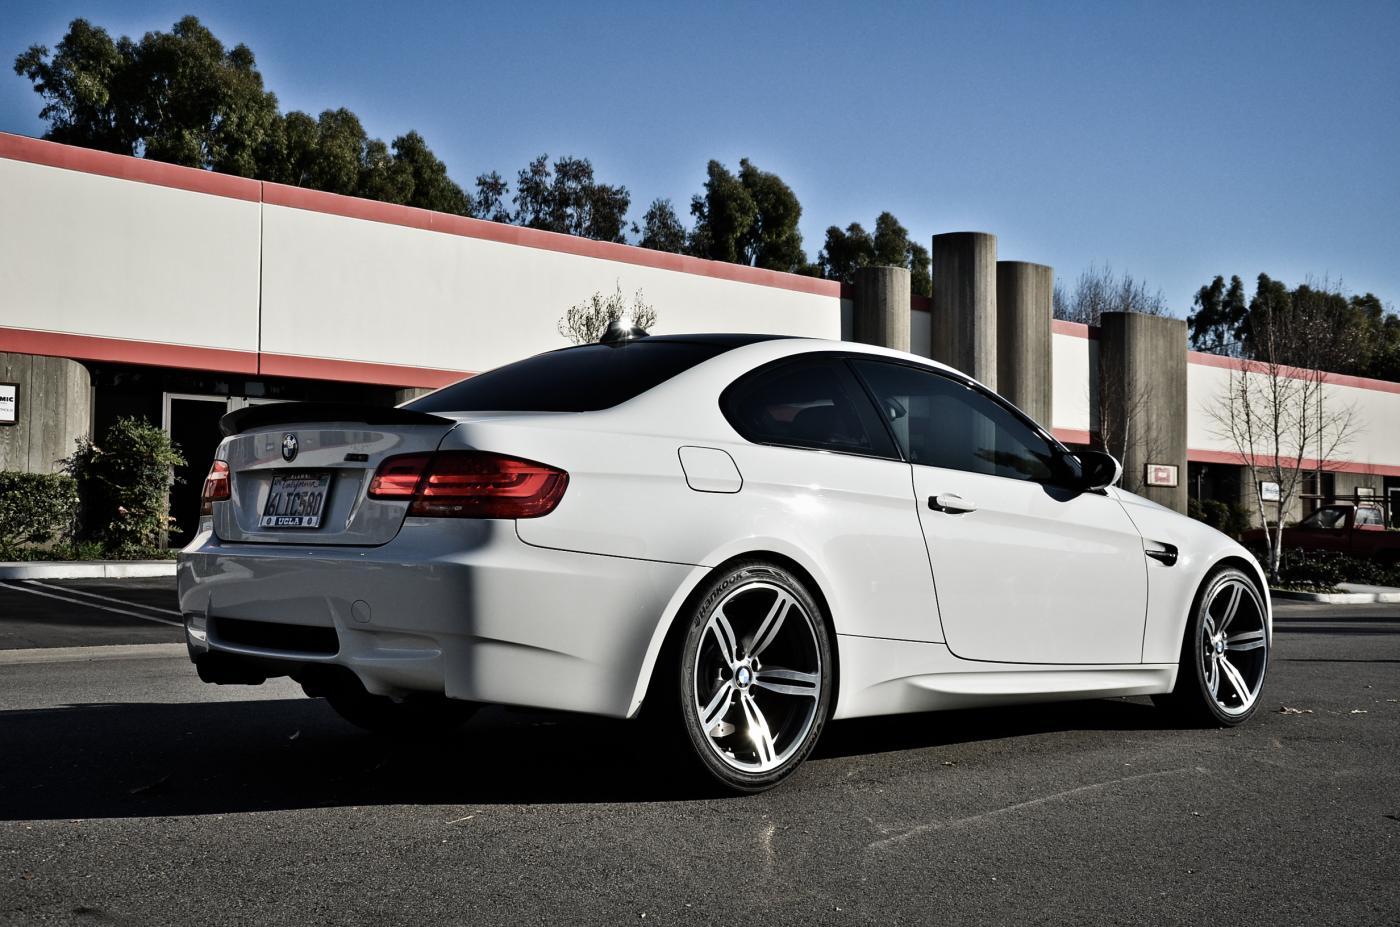 Bay Area - F/S (4) OEM M6 rims w/ tires-m62.jpg